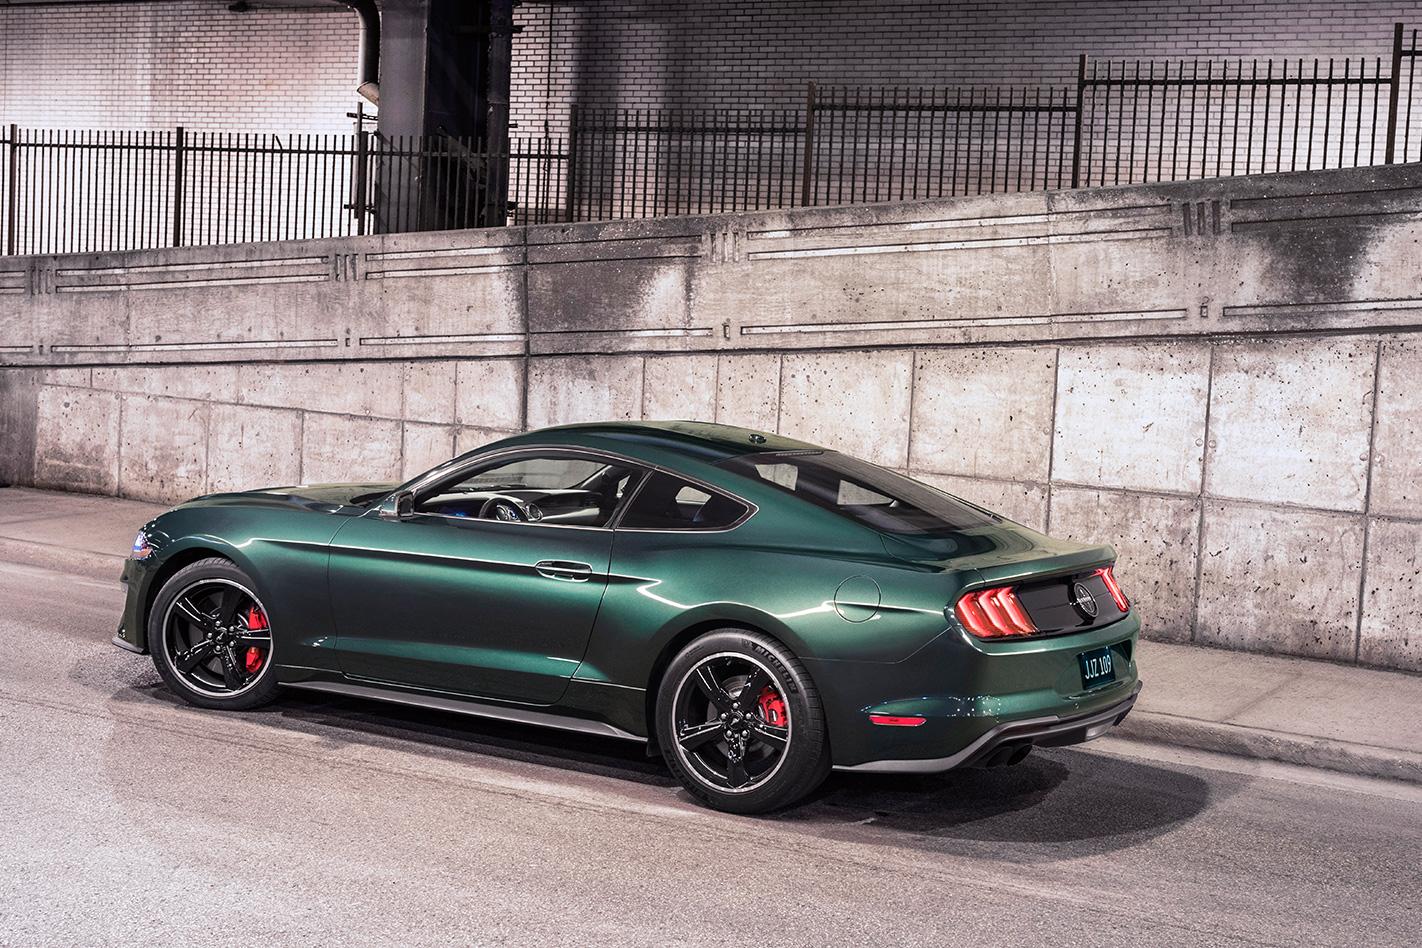 2018 Mustang Bullitt Price